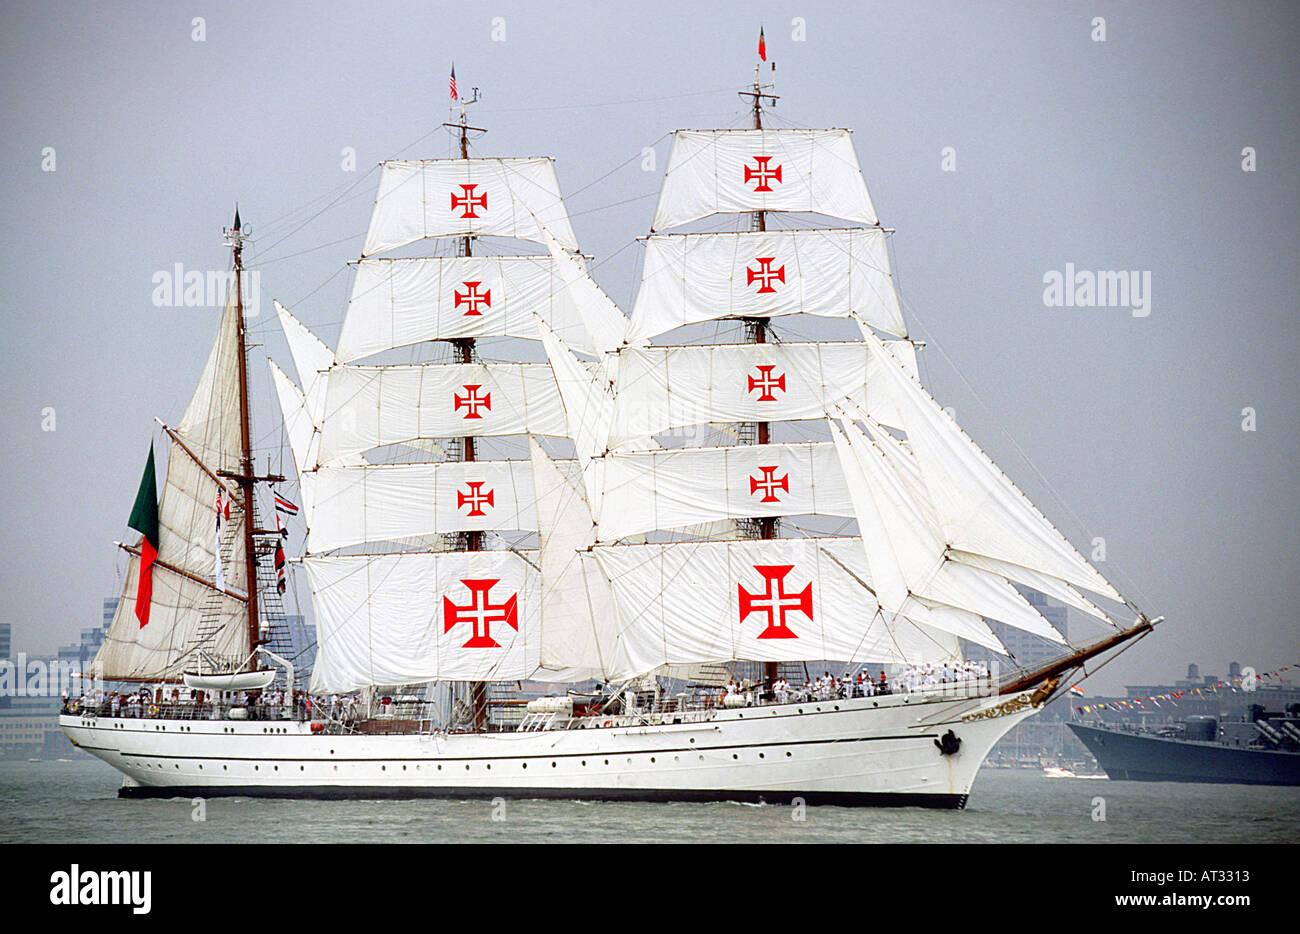 Tall Ship Bark Sagres New York City Hudson River - Stock Image